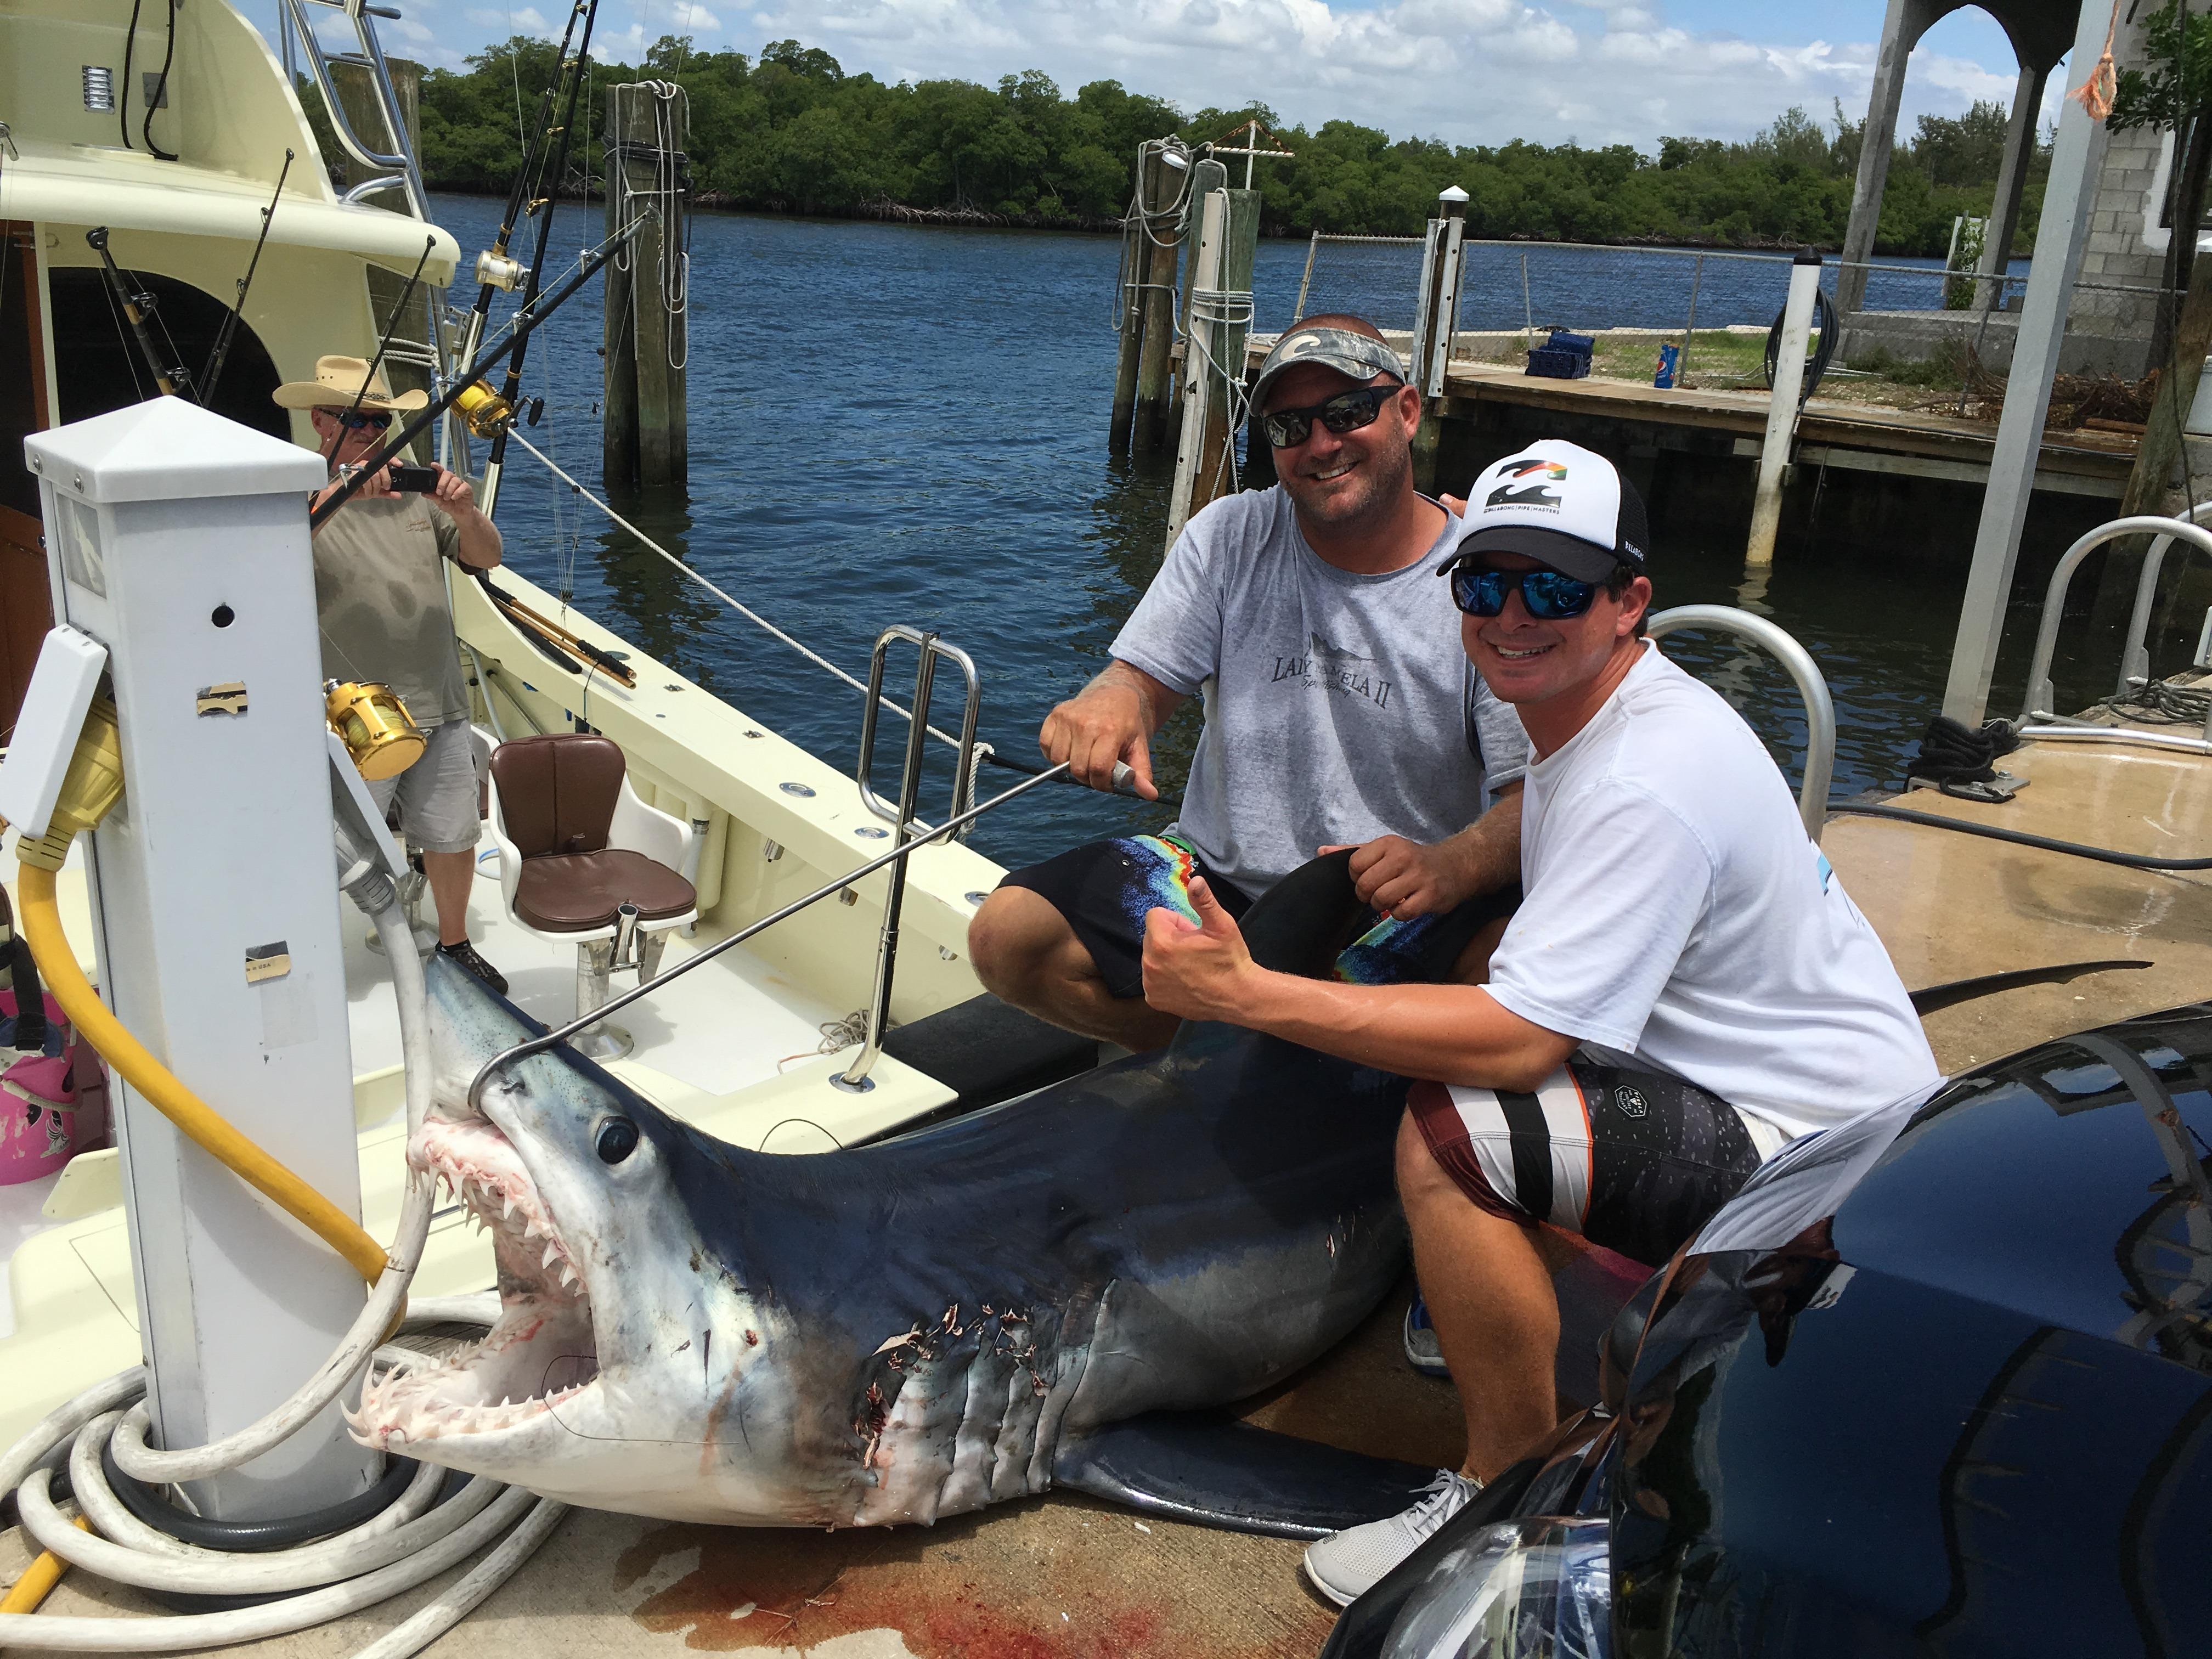 Private sportfishing fort lauderdale fishing charters for Fort lauderdale fishing charters